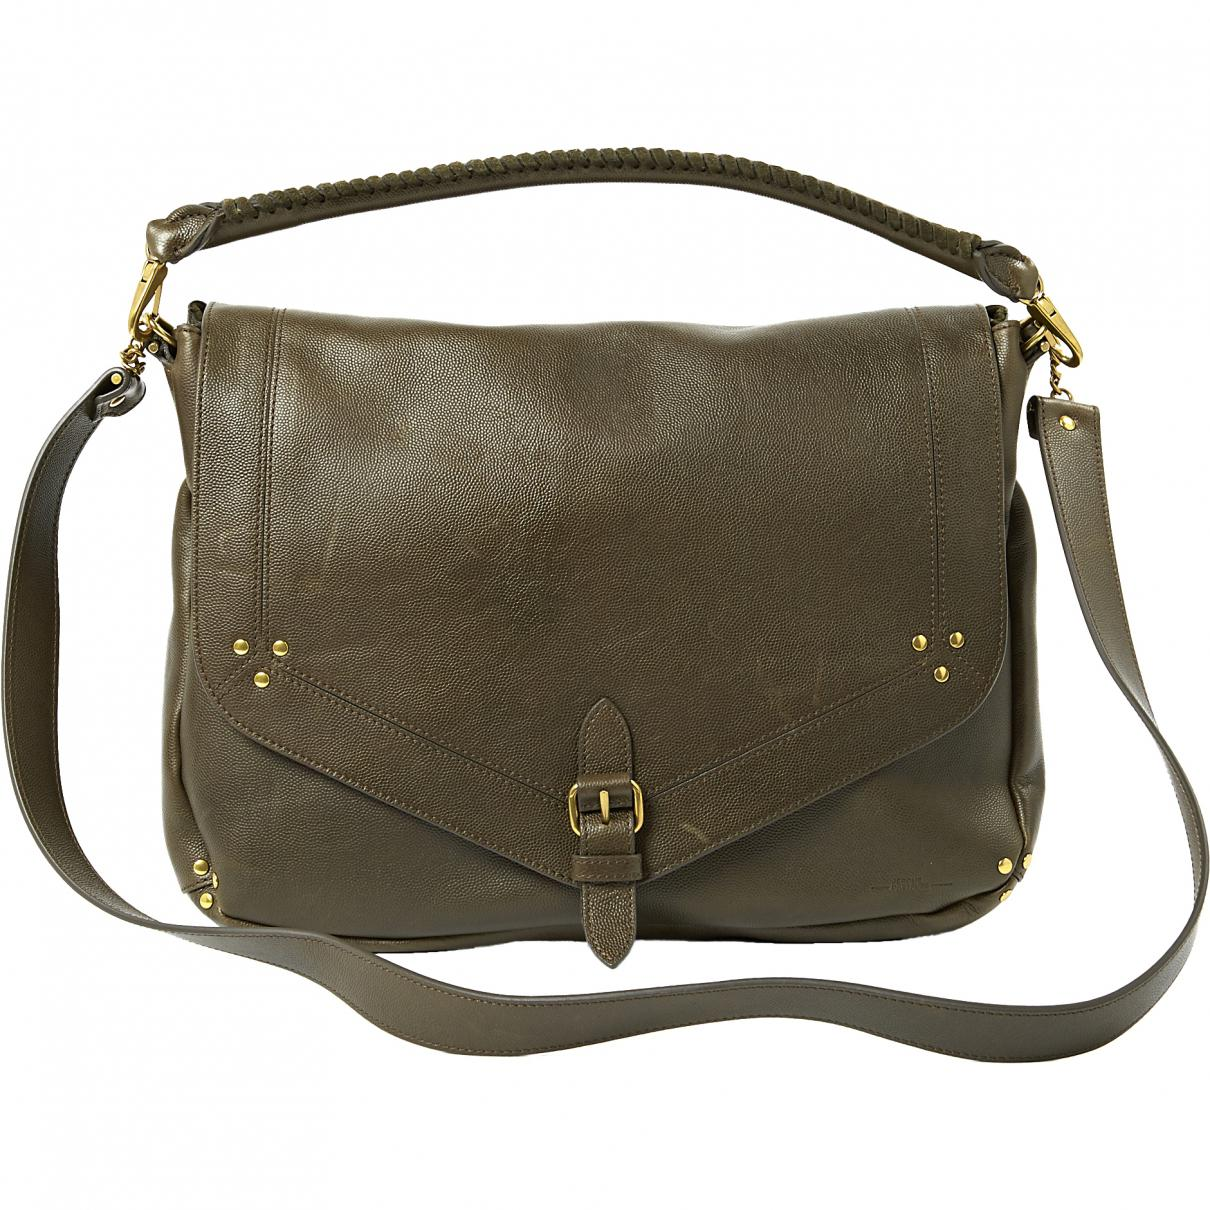 Jerome Dreyfuss Pre-owned - Blue Handbag RVV53nifn